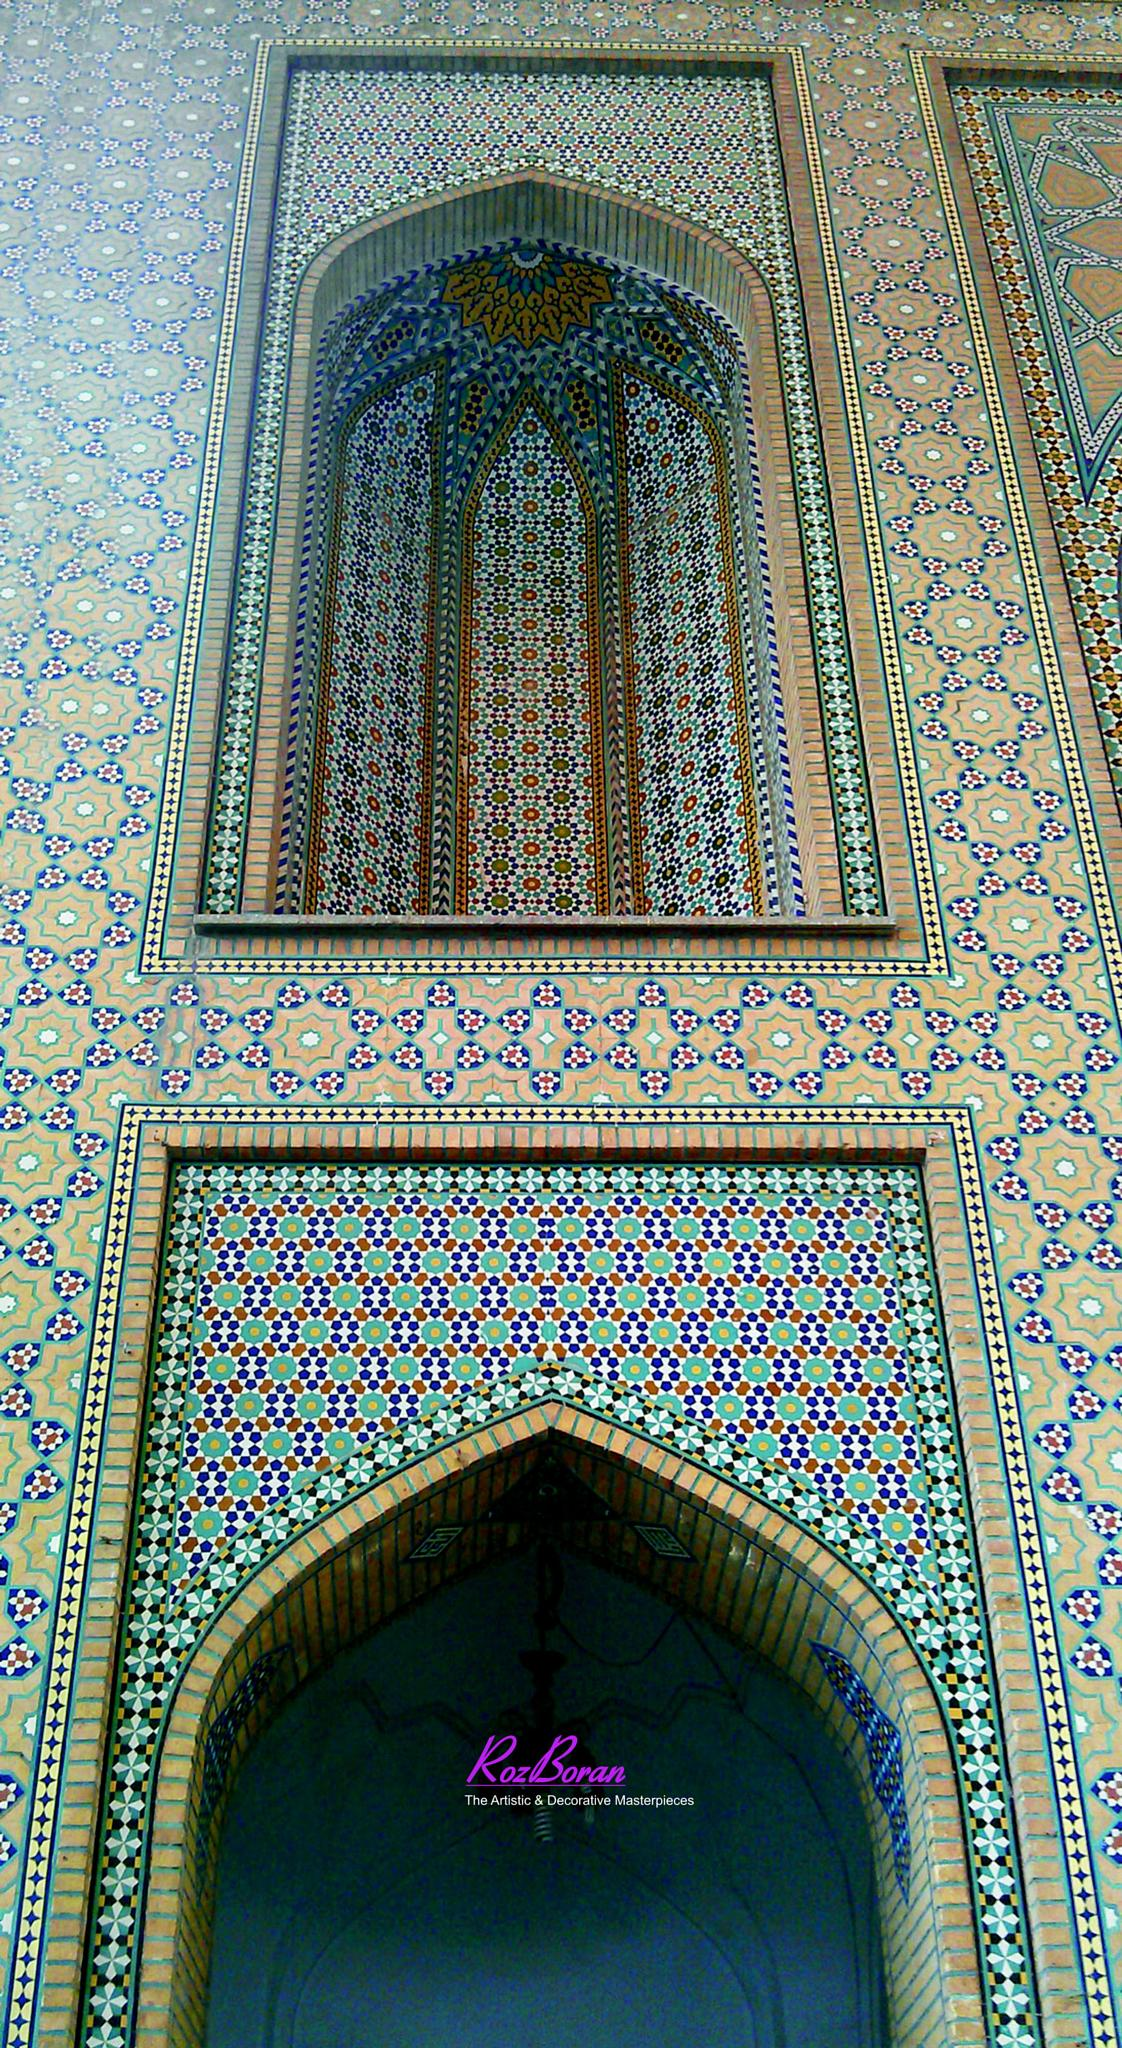 The Art of Tiles & Bricks by R O Z B O R A N